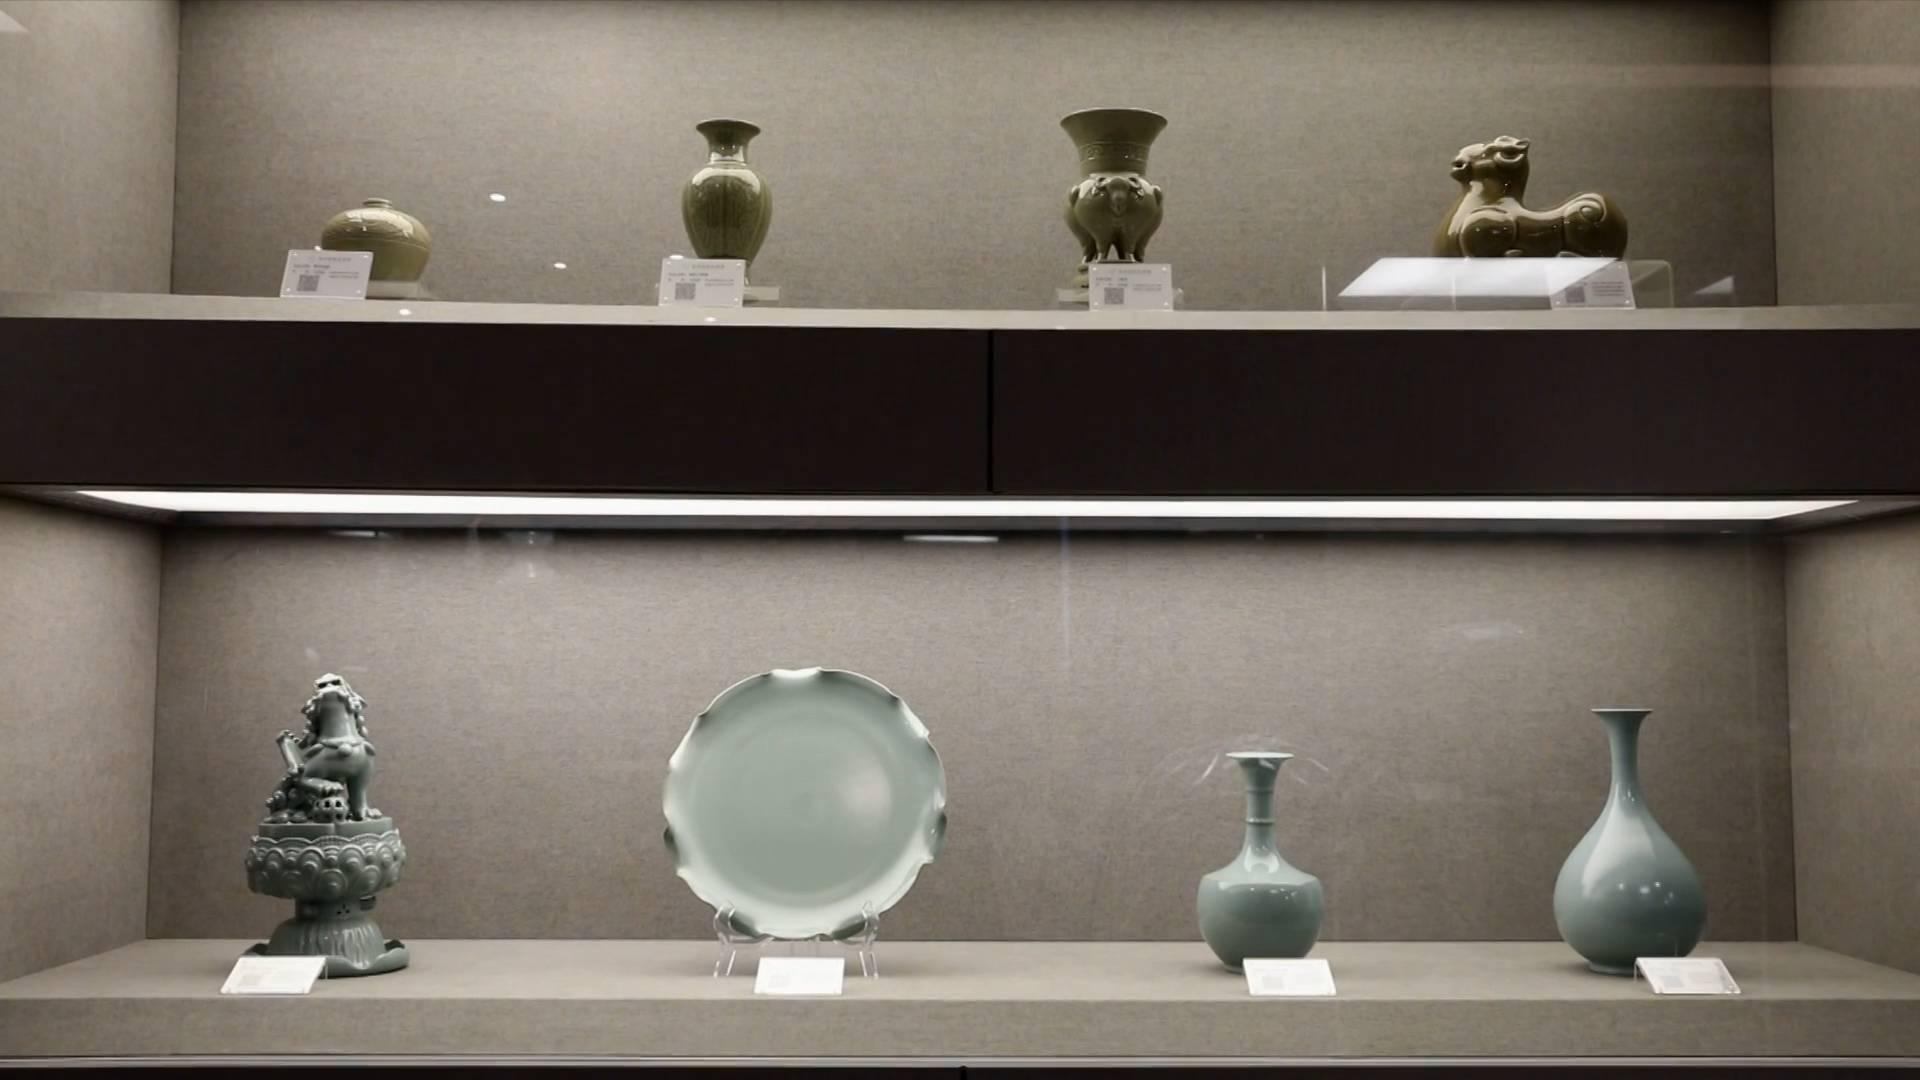 Craftsman seeks to reproduce Ru porcelain's azure glaze